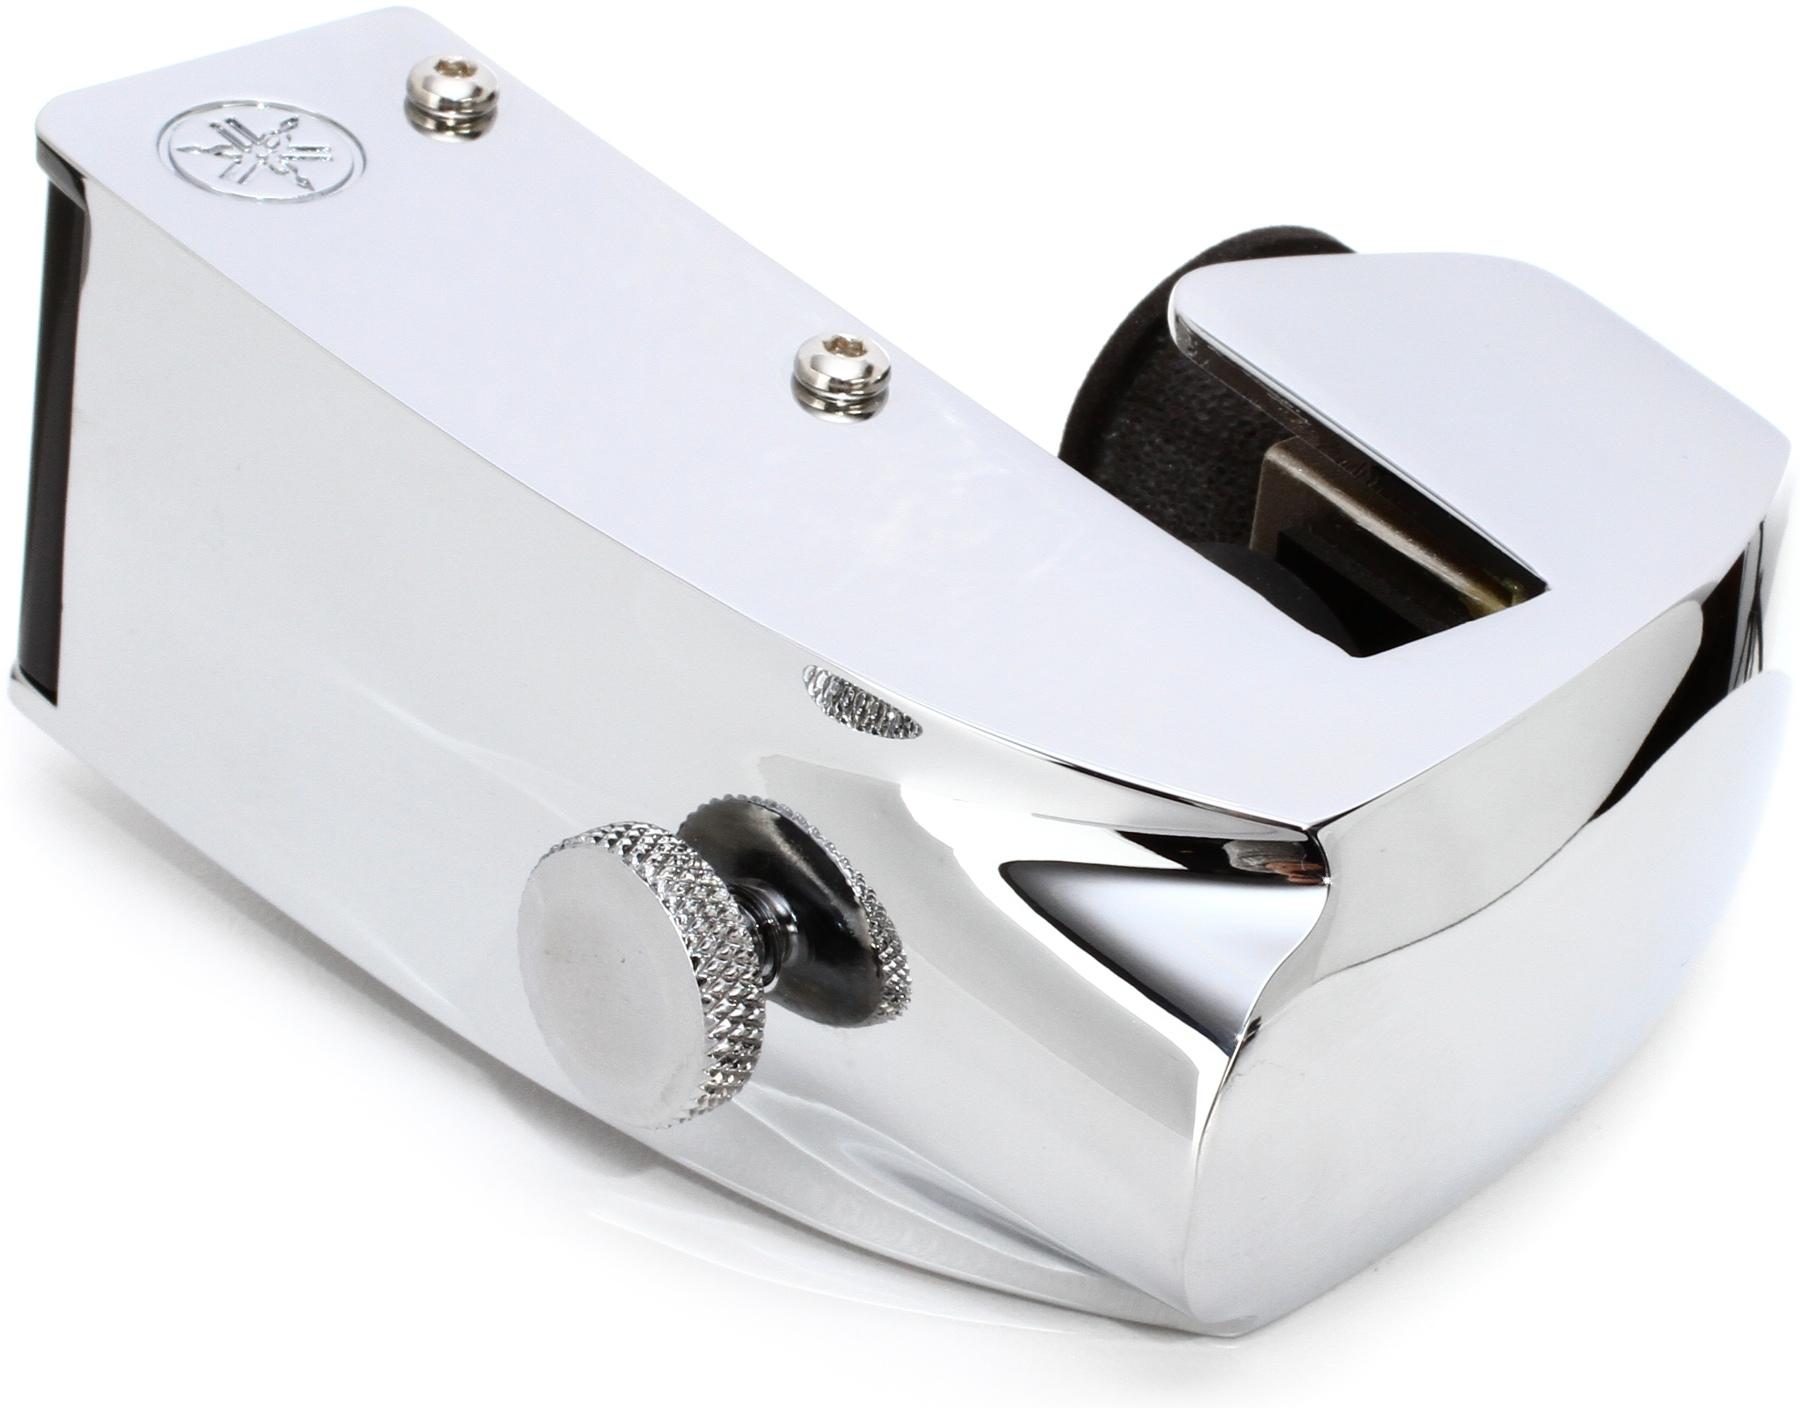 6. Yamaha DT-50K Metal Body Acoustic Bass Drum Trigger